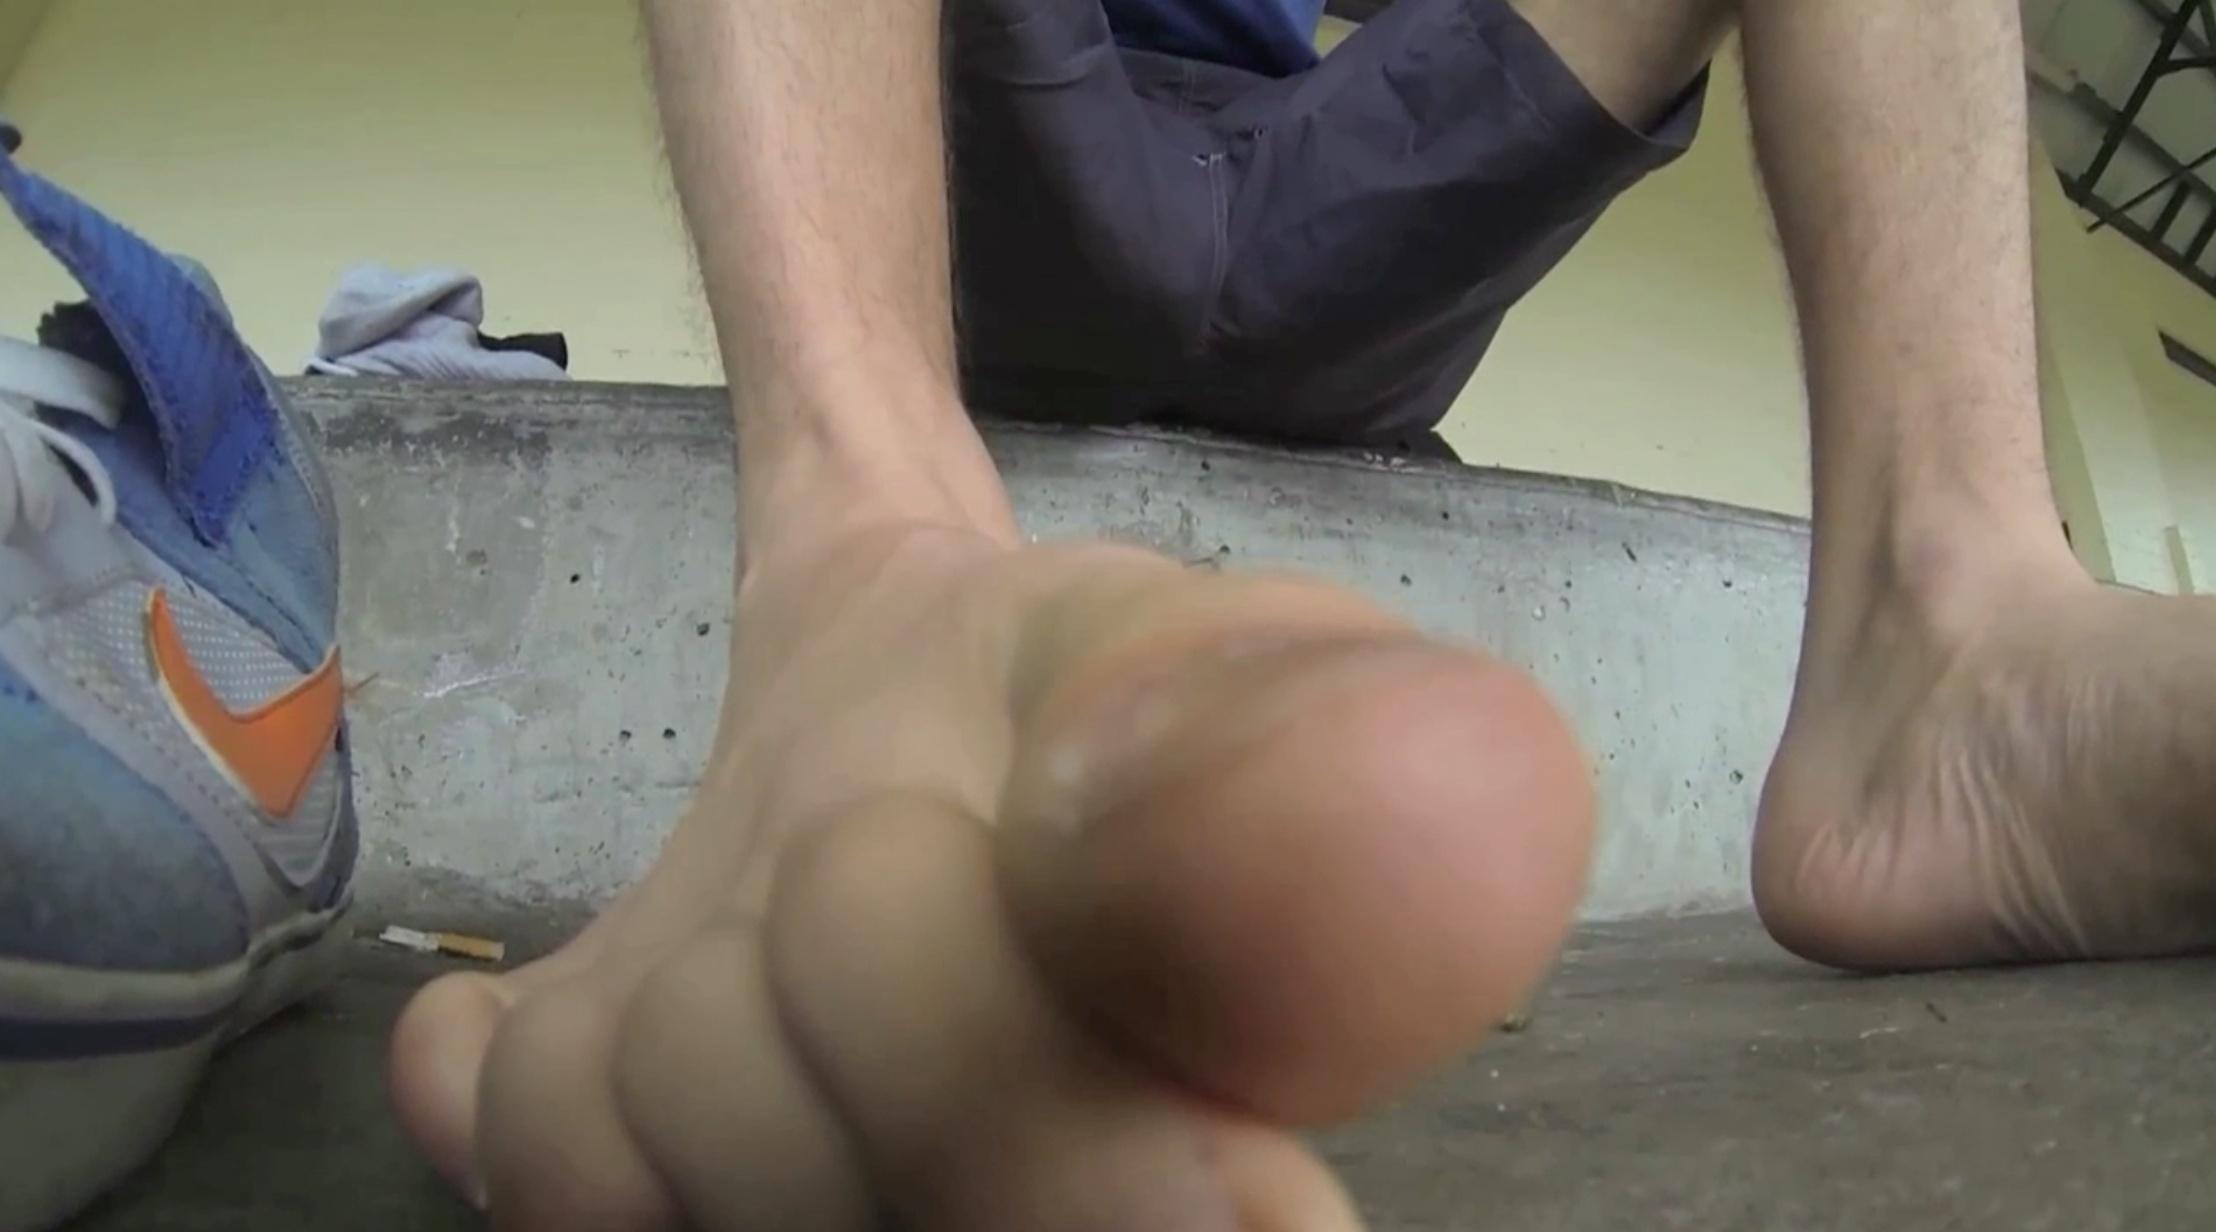 Hiding in Carl's shoe again